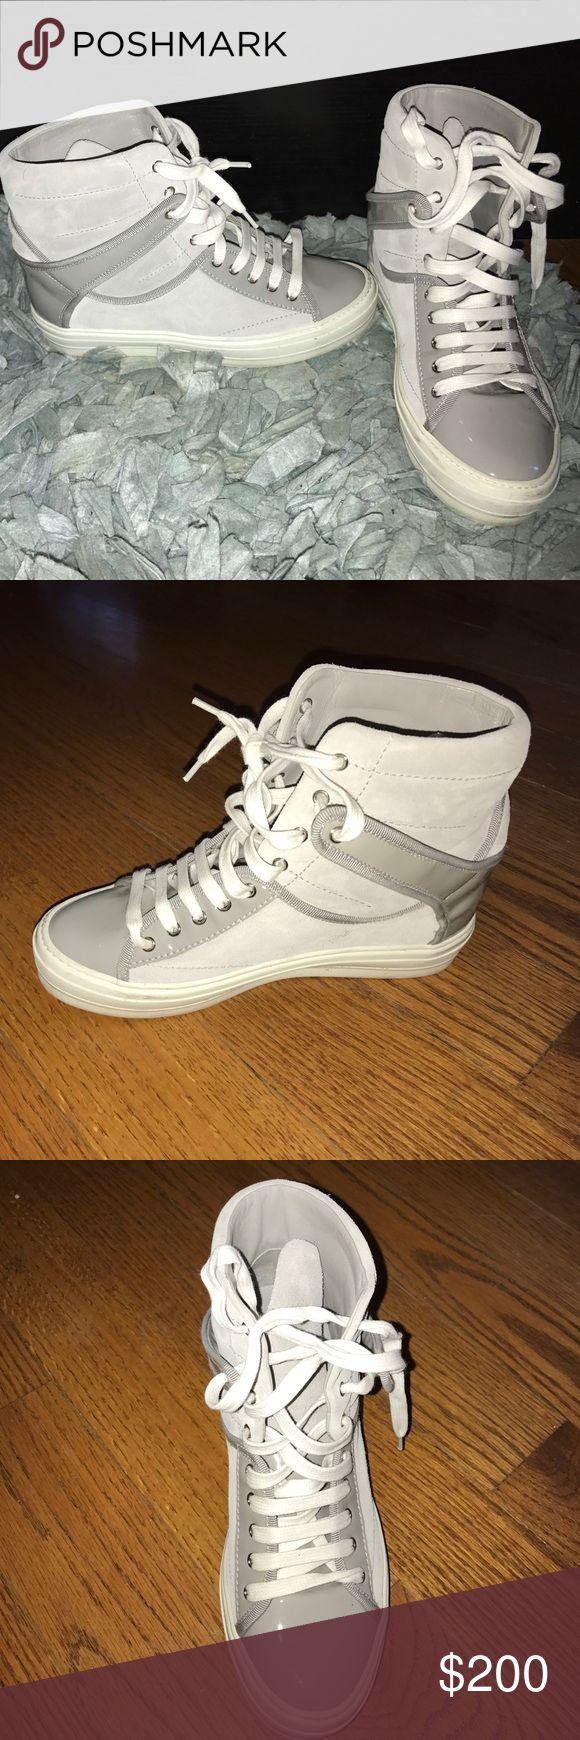 Selling this Salvatore Ferragamo wedge sneakers on Poshmark! My username is: classicacosta. #shopmycloset #poshmark #fashion #shopping #style #forsale #Salvatore Ferragamo #Shoes